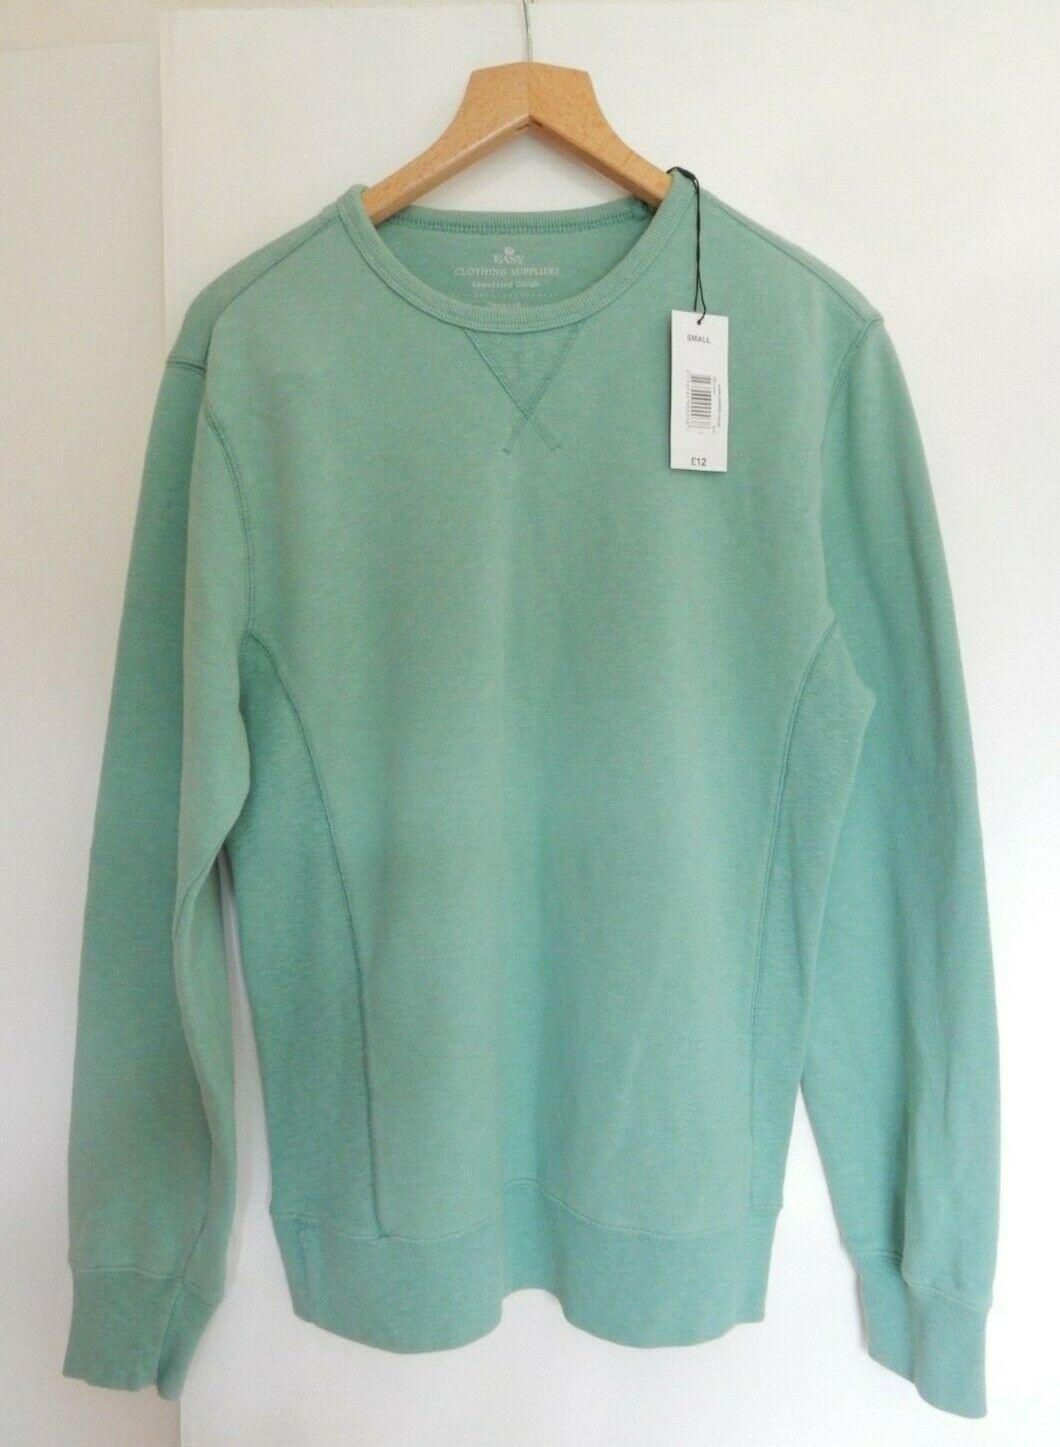 Men's green sweatshirt BNWT Size S 100% Cotton